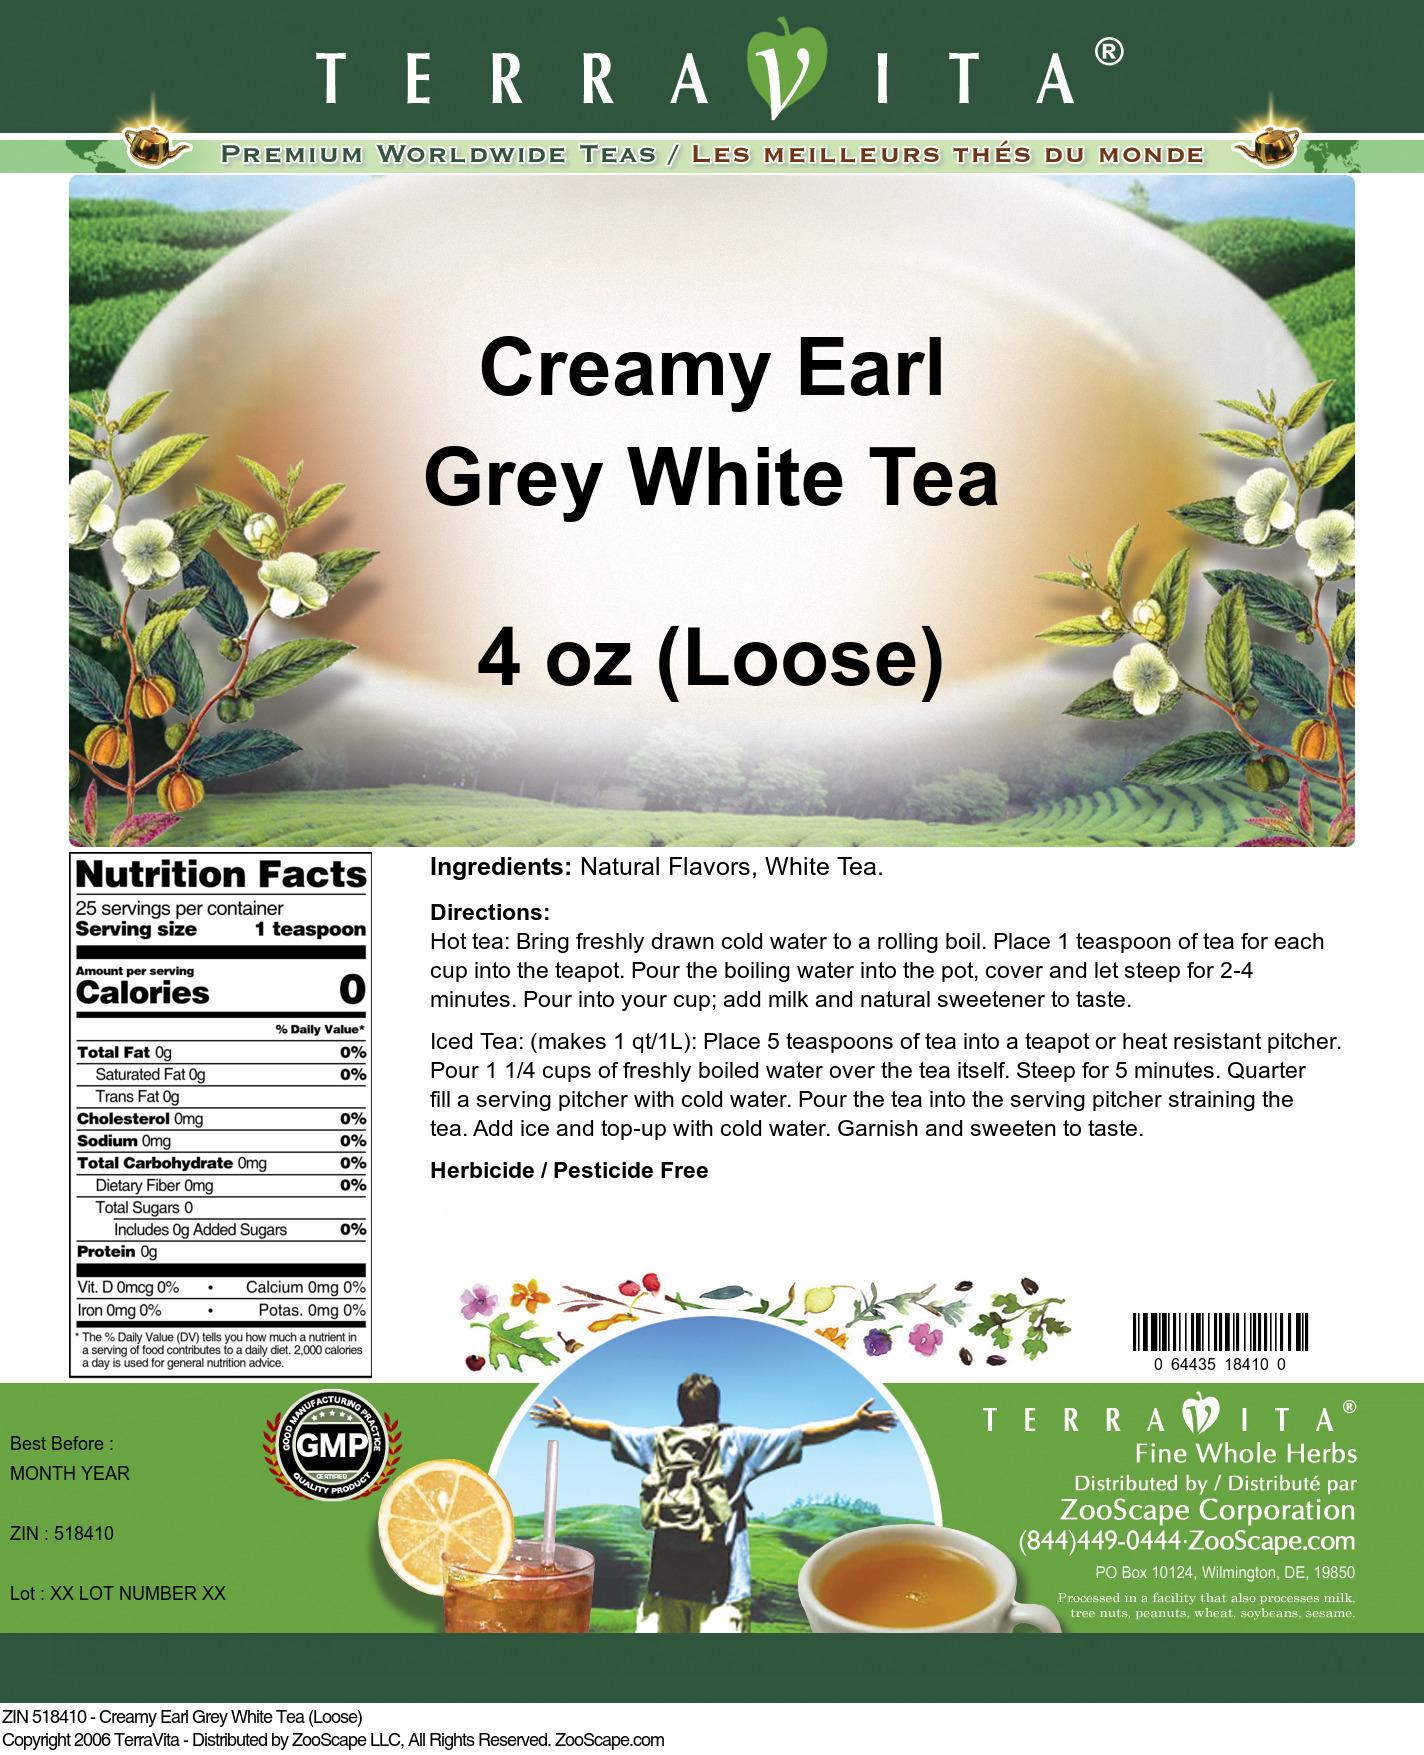 Creamy Earl Grey White Tea (Loose)